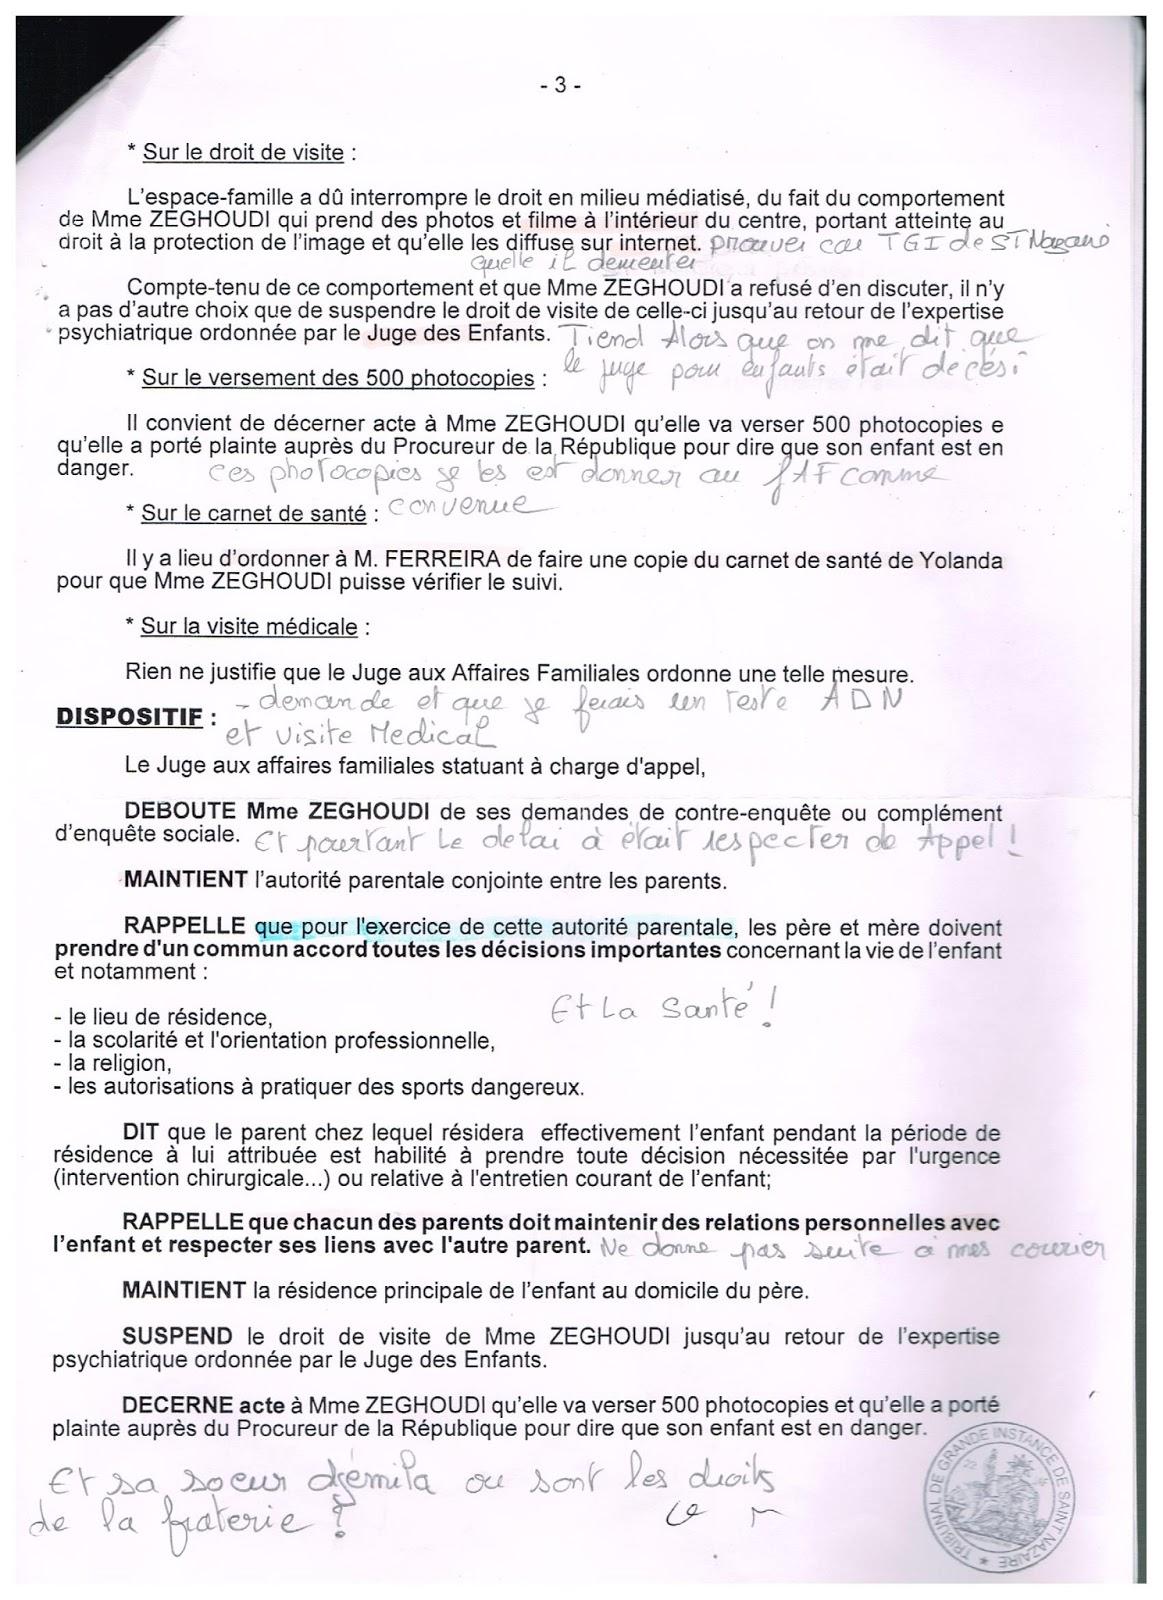 hr manager resume pdf creative director resume templates